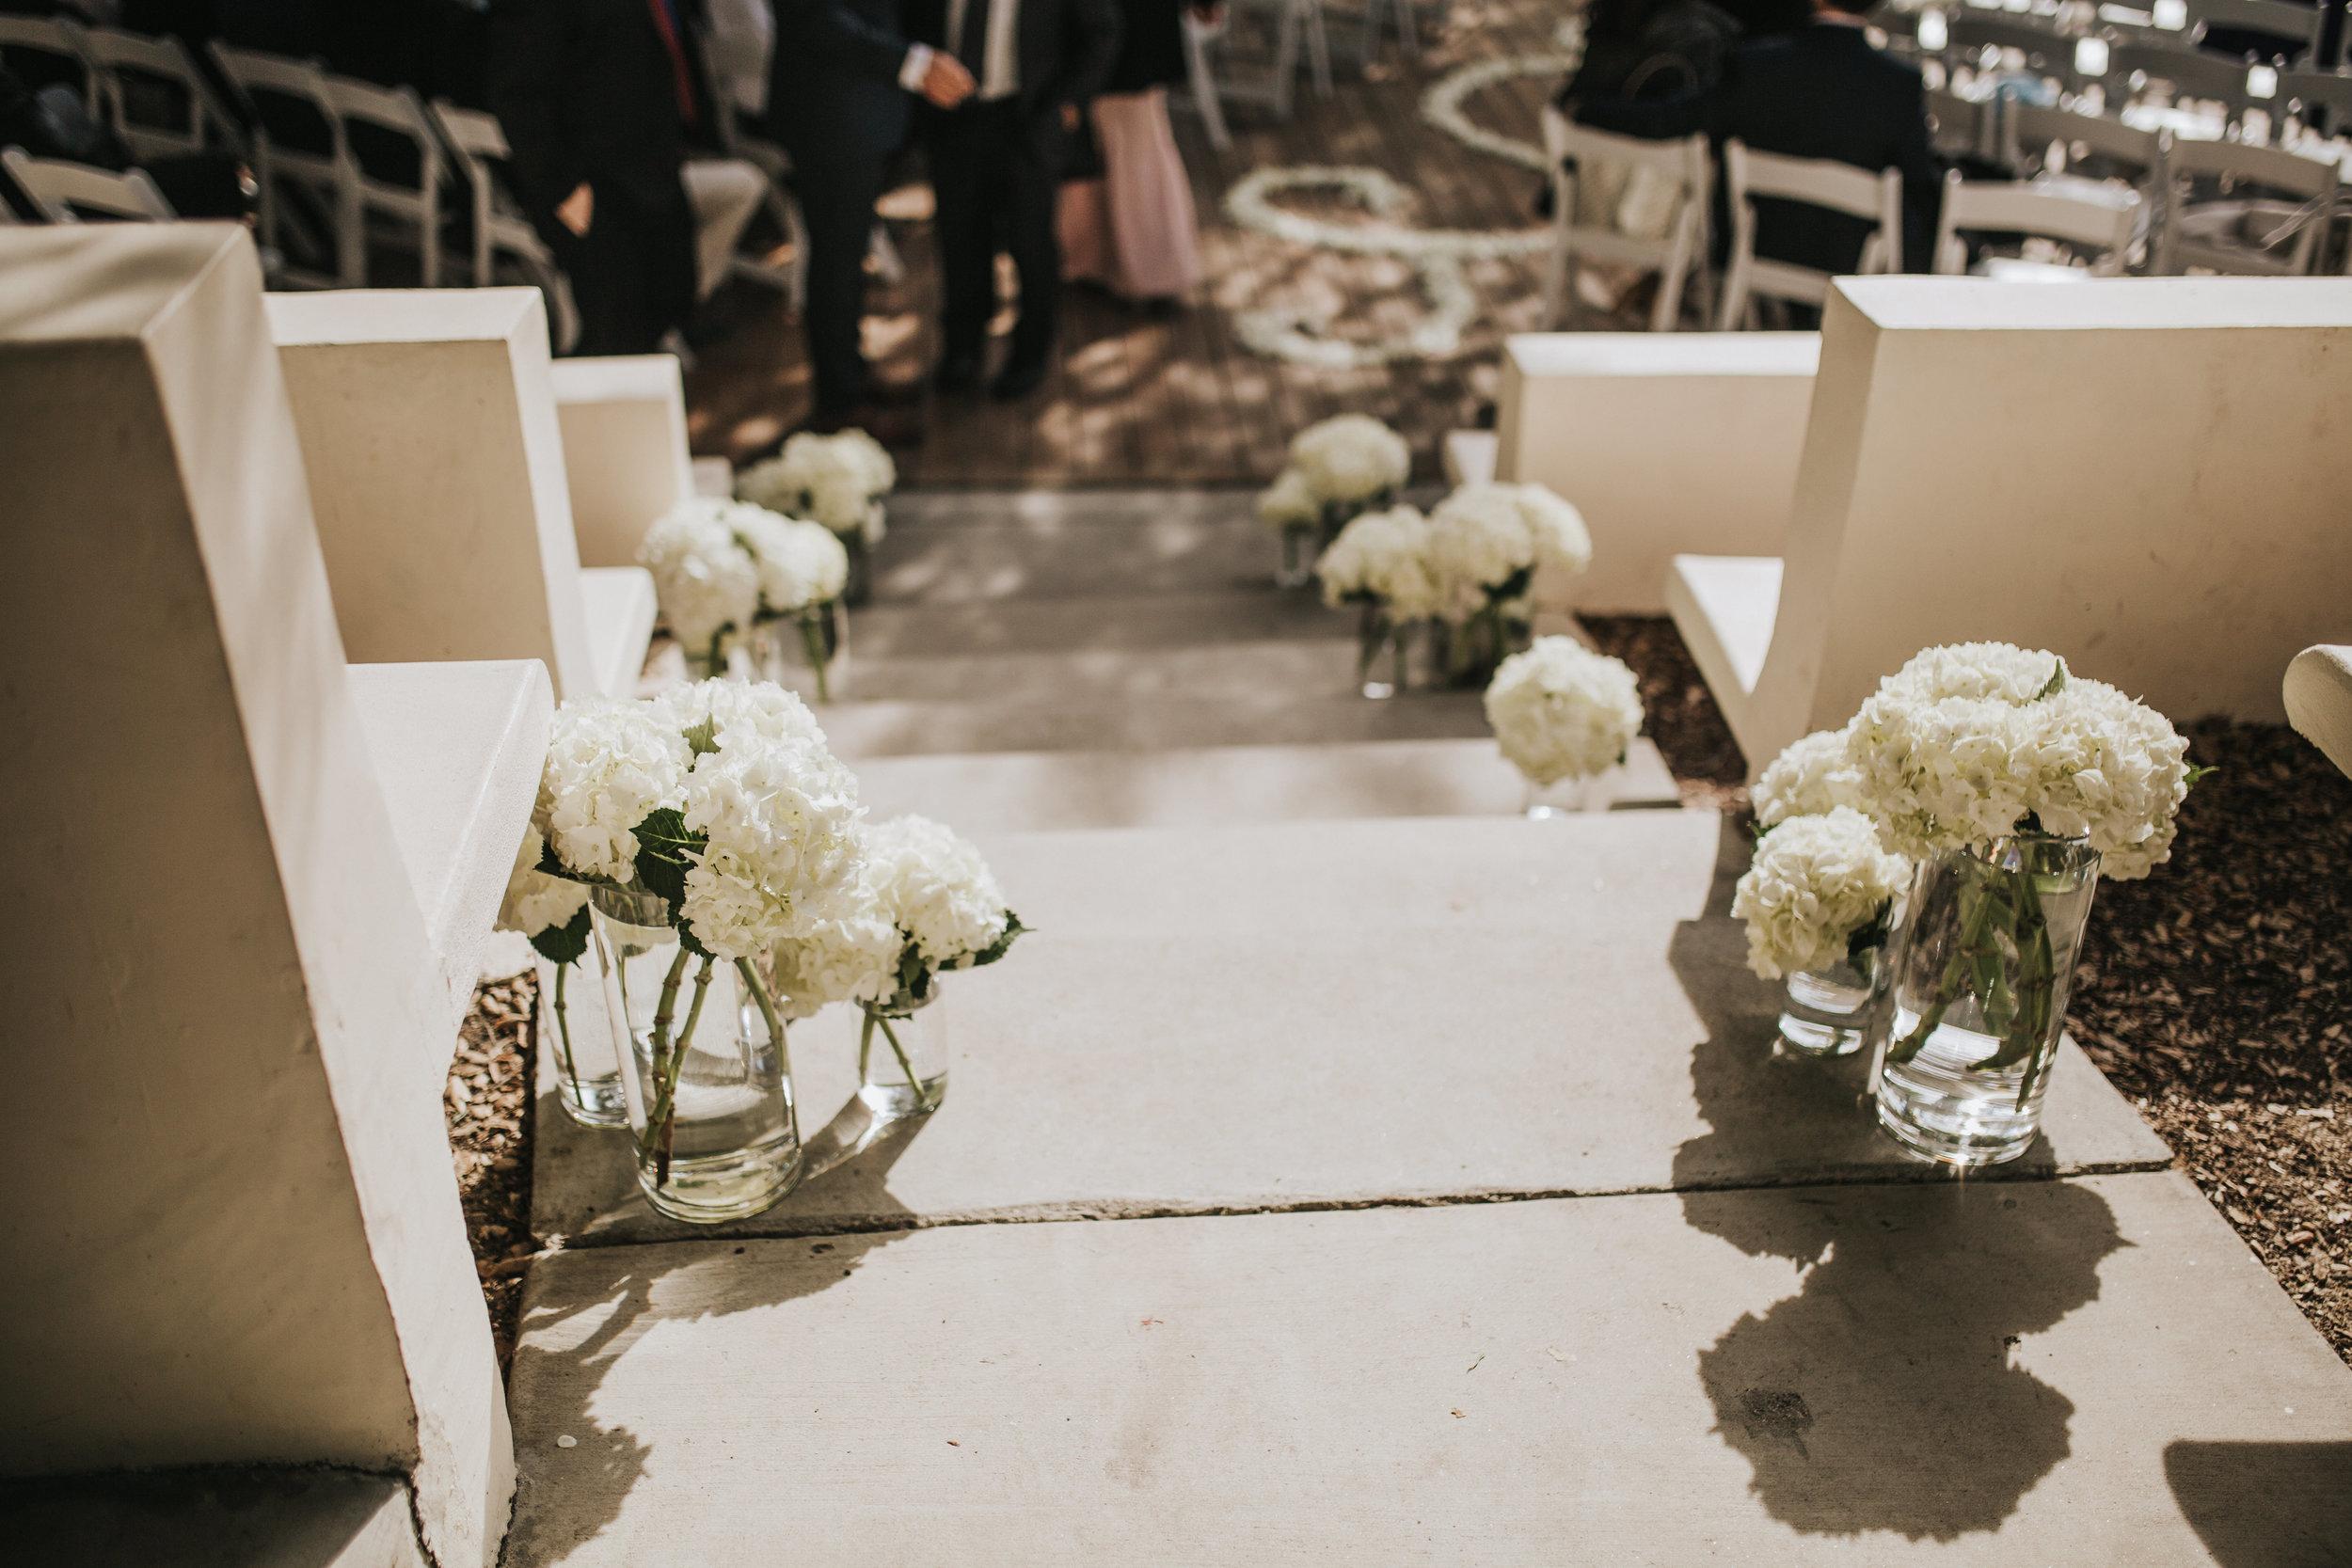 The 1909, The 1909 Wedding, Topanga Canyon wedding, Topanga Canyon, Hydrangea arrangement, hydrangea stair arrangement